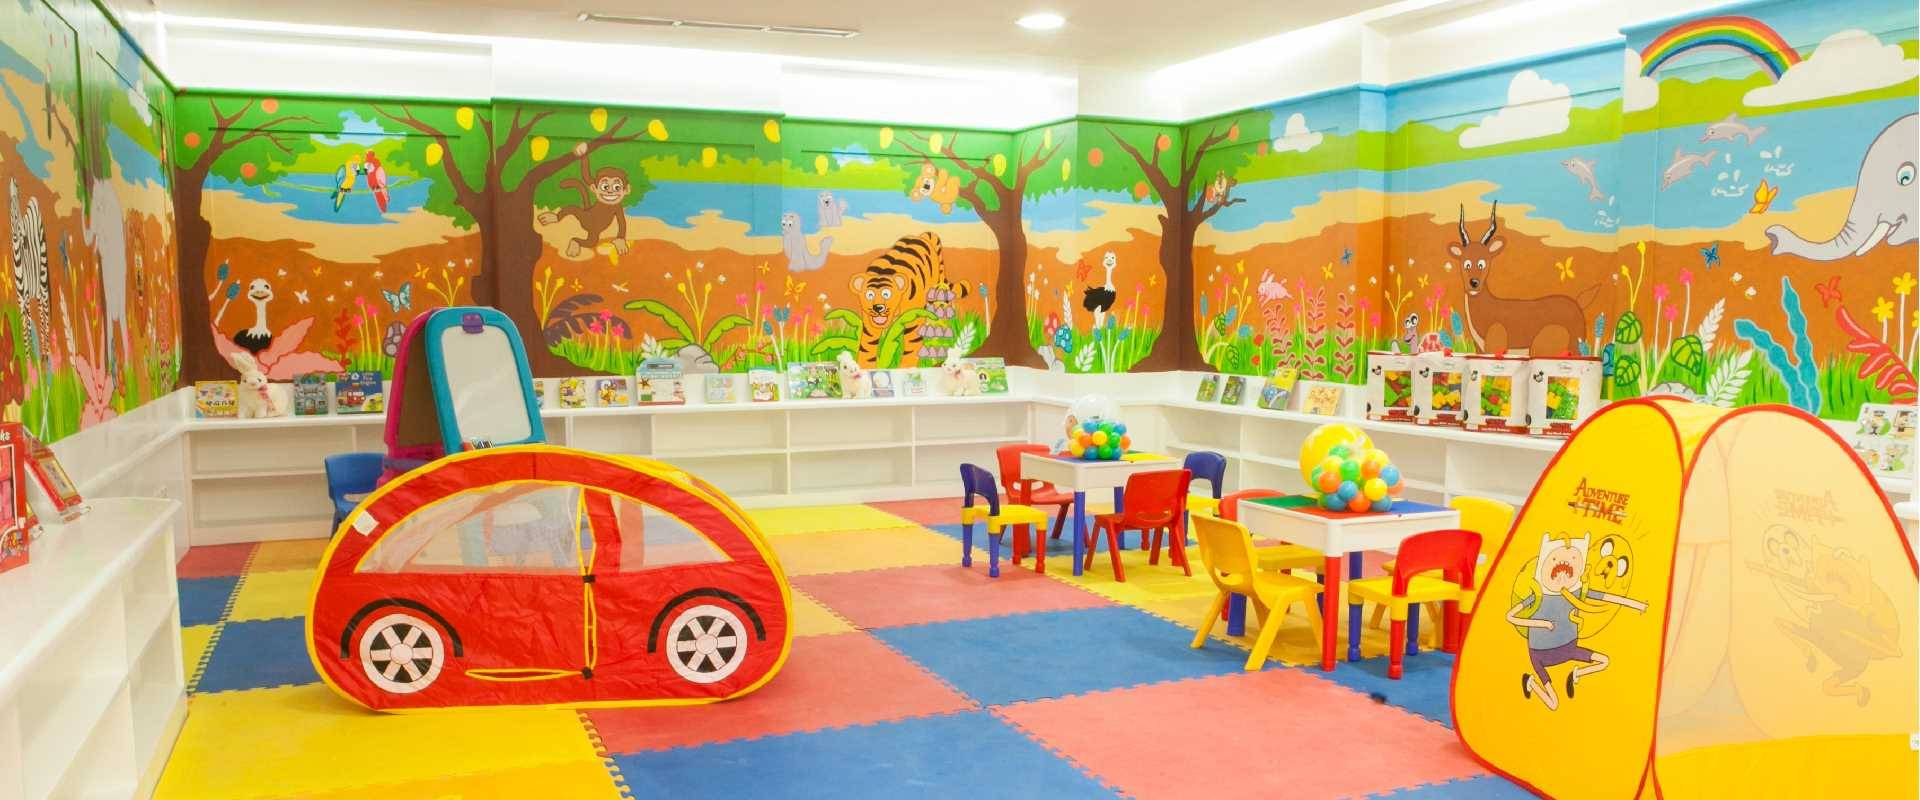 piccolo kids club facilities marco polo plaza cebu. Black Bedroom Furniture Sets. Home Design Ideas